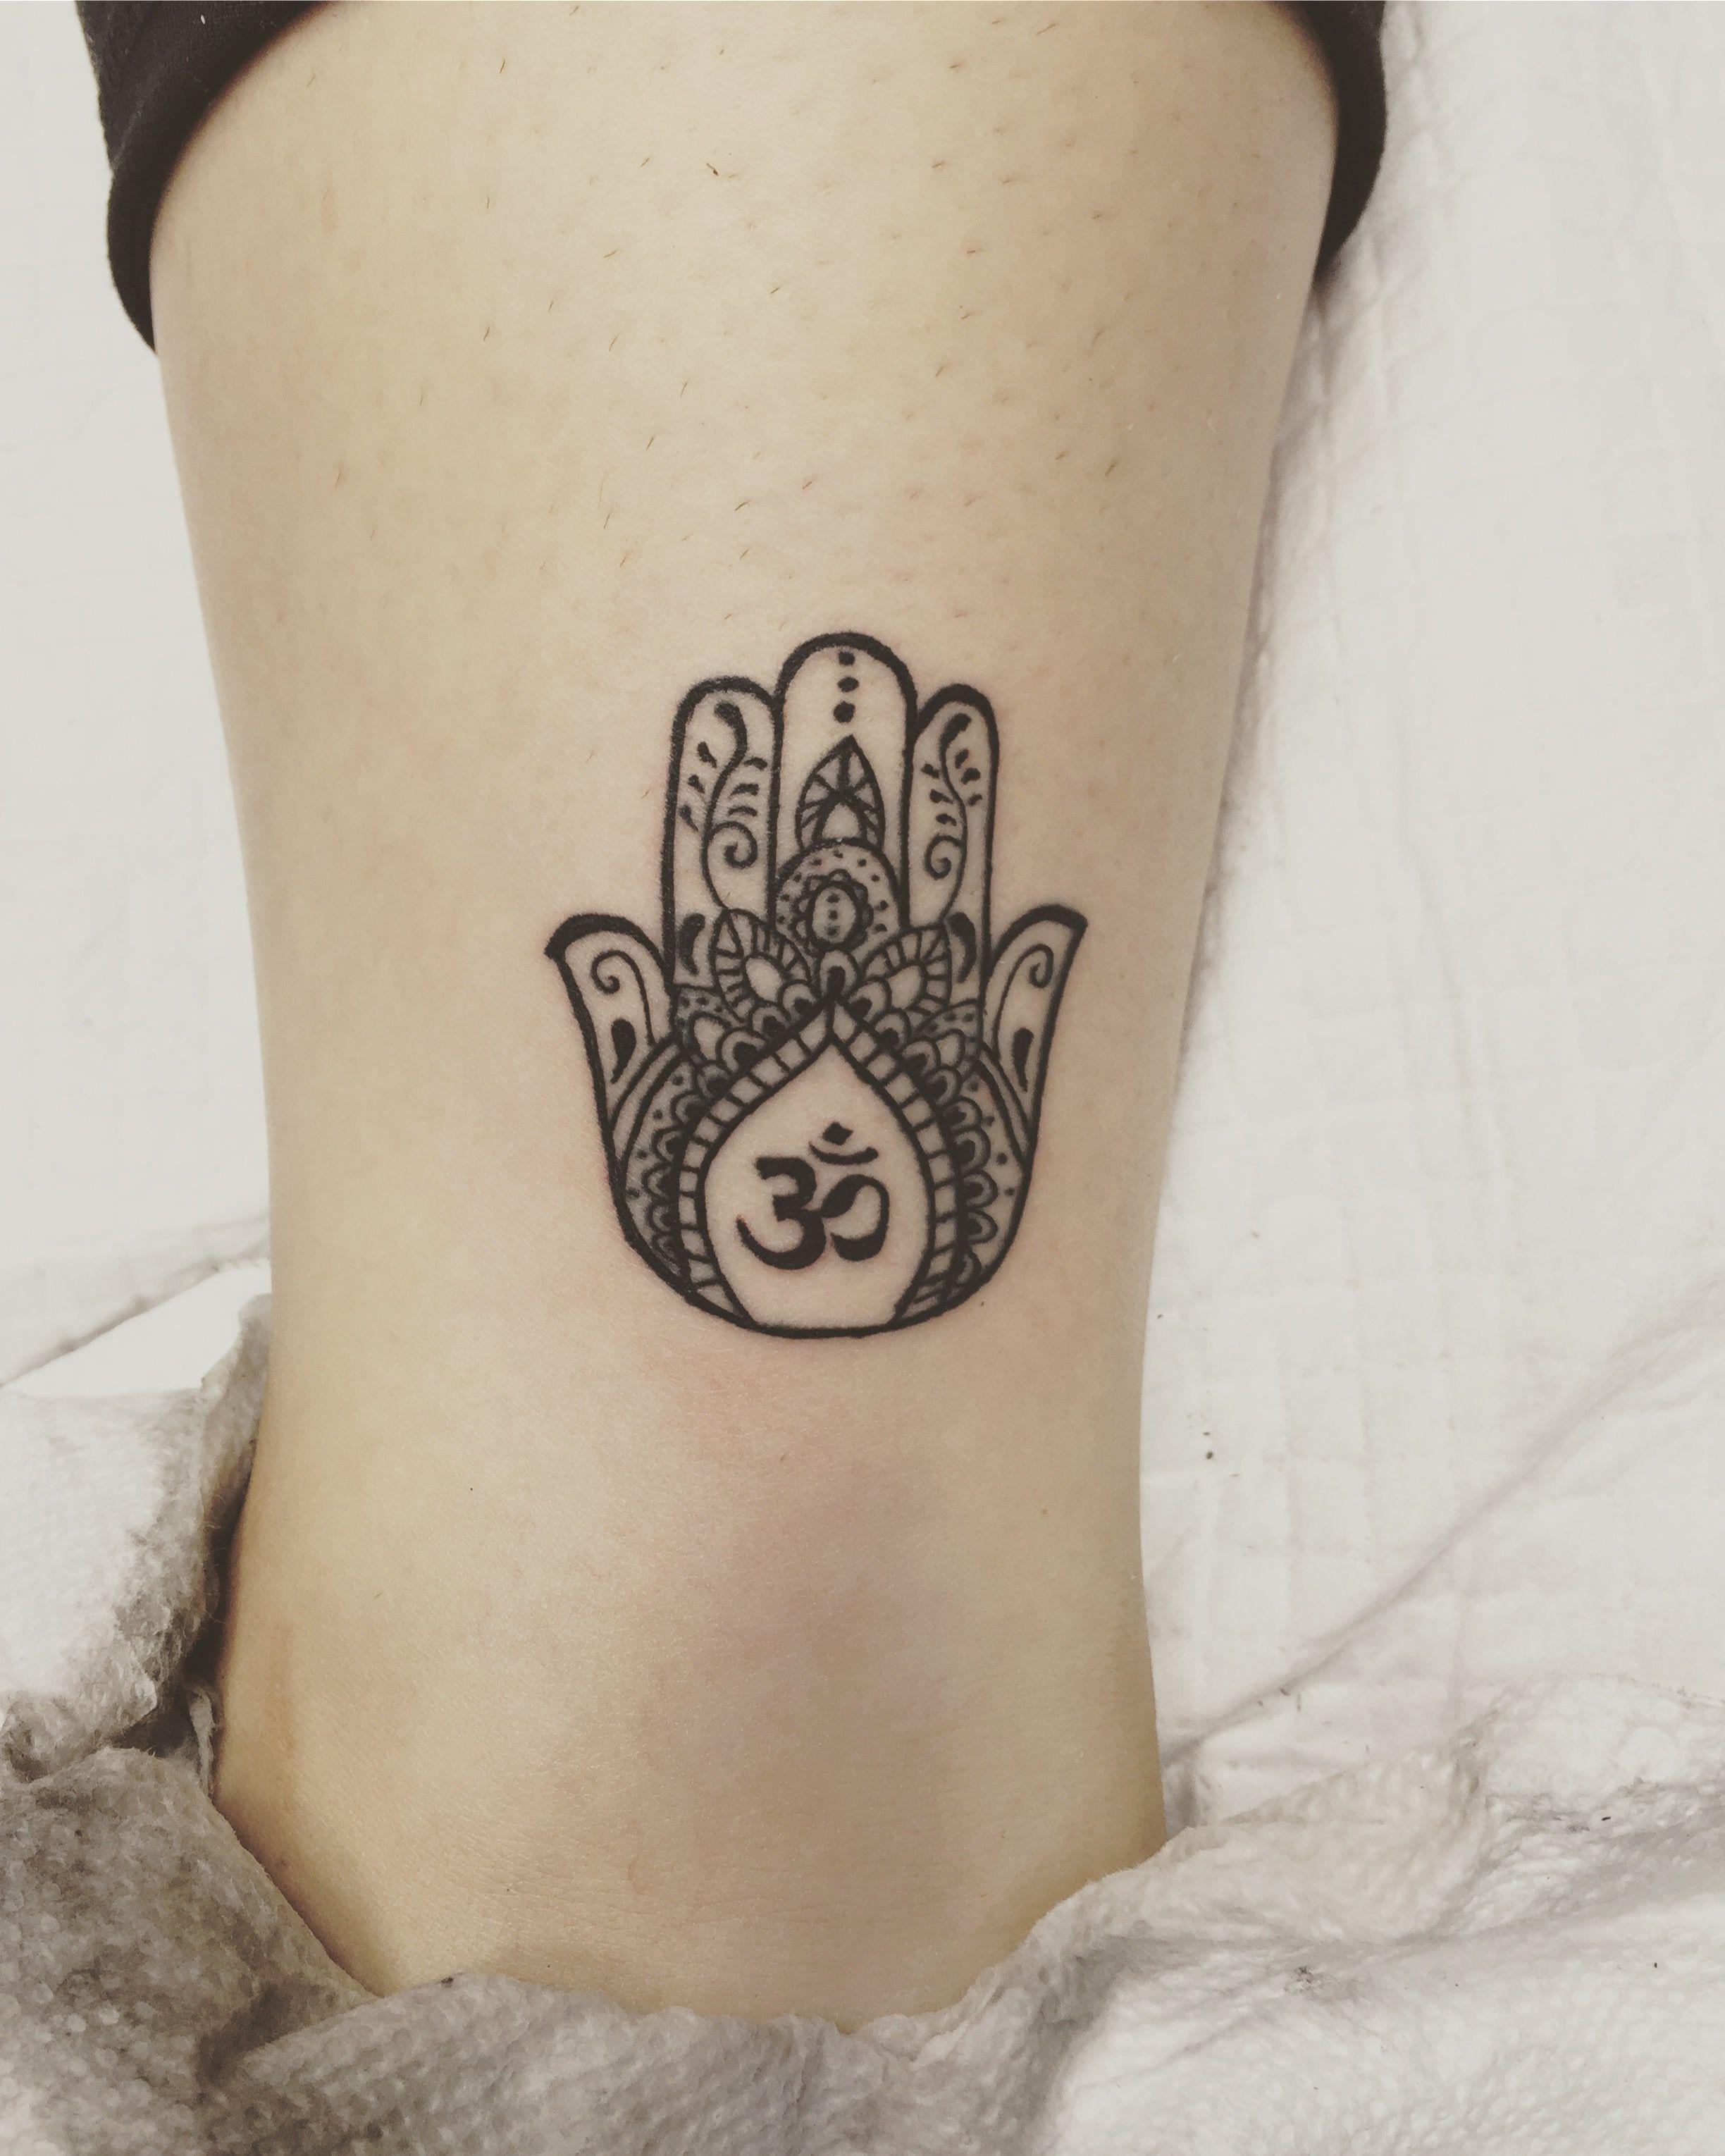 My third tattoo hamsa and aum myfavoritetattoos tattos my third tattoo hamsa and aum myfavoritetattoos buycottarizona Image collections